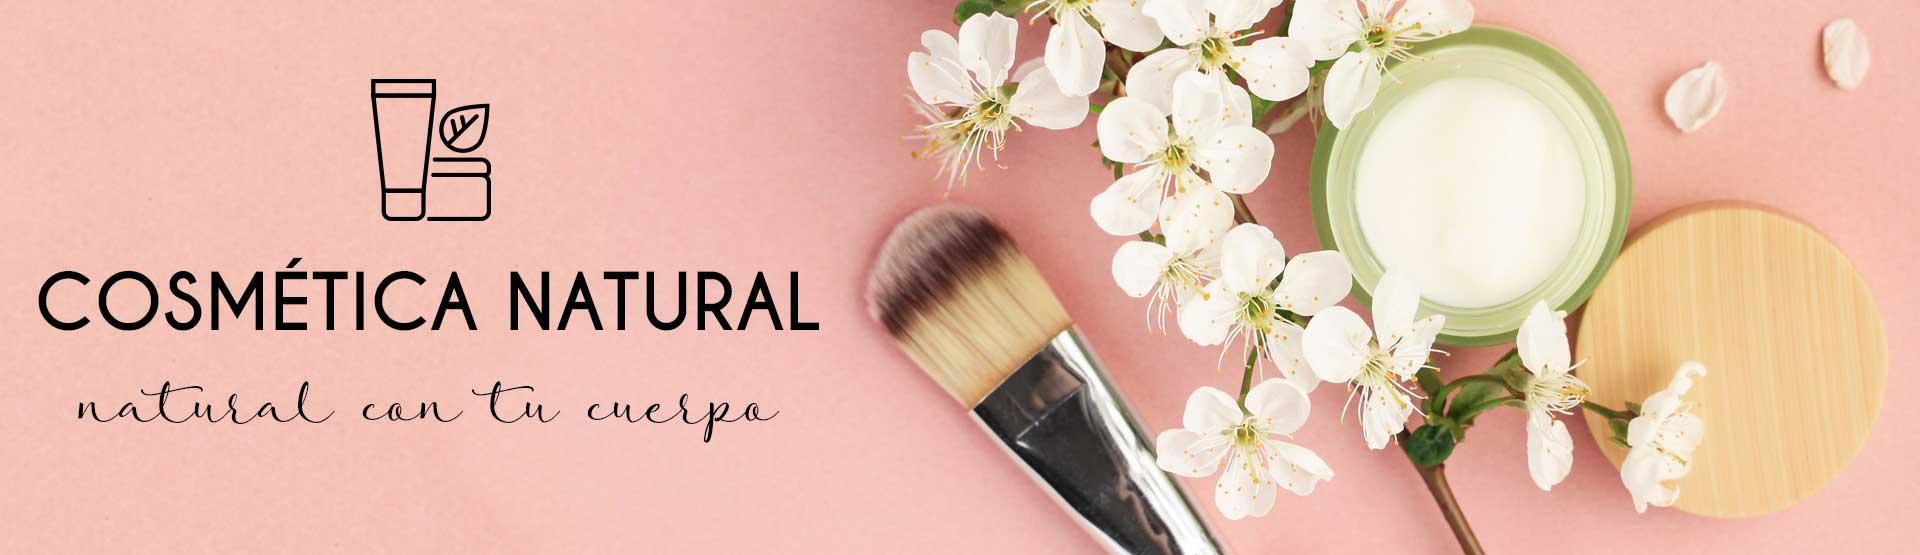 cosmética natural y vegana